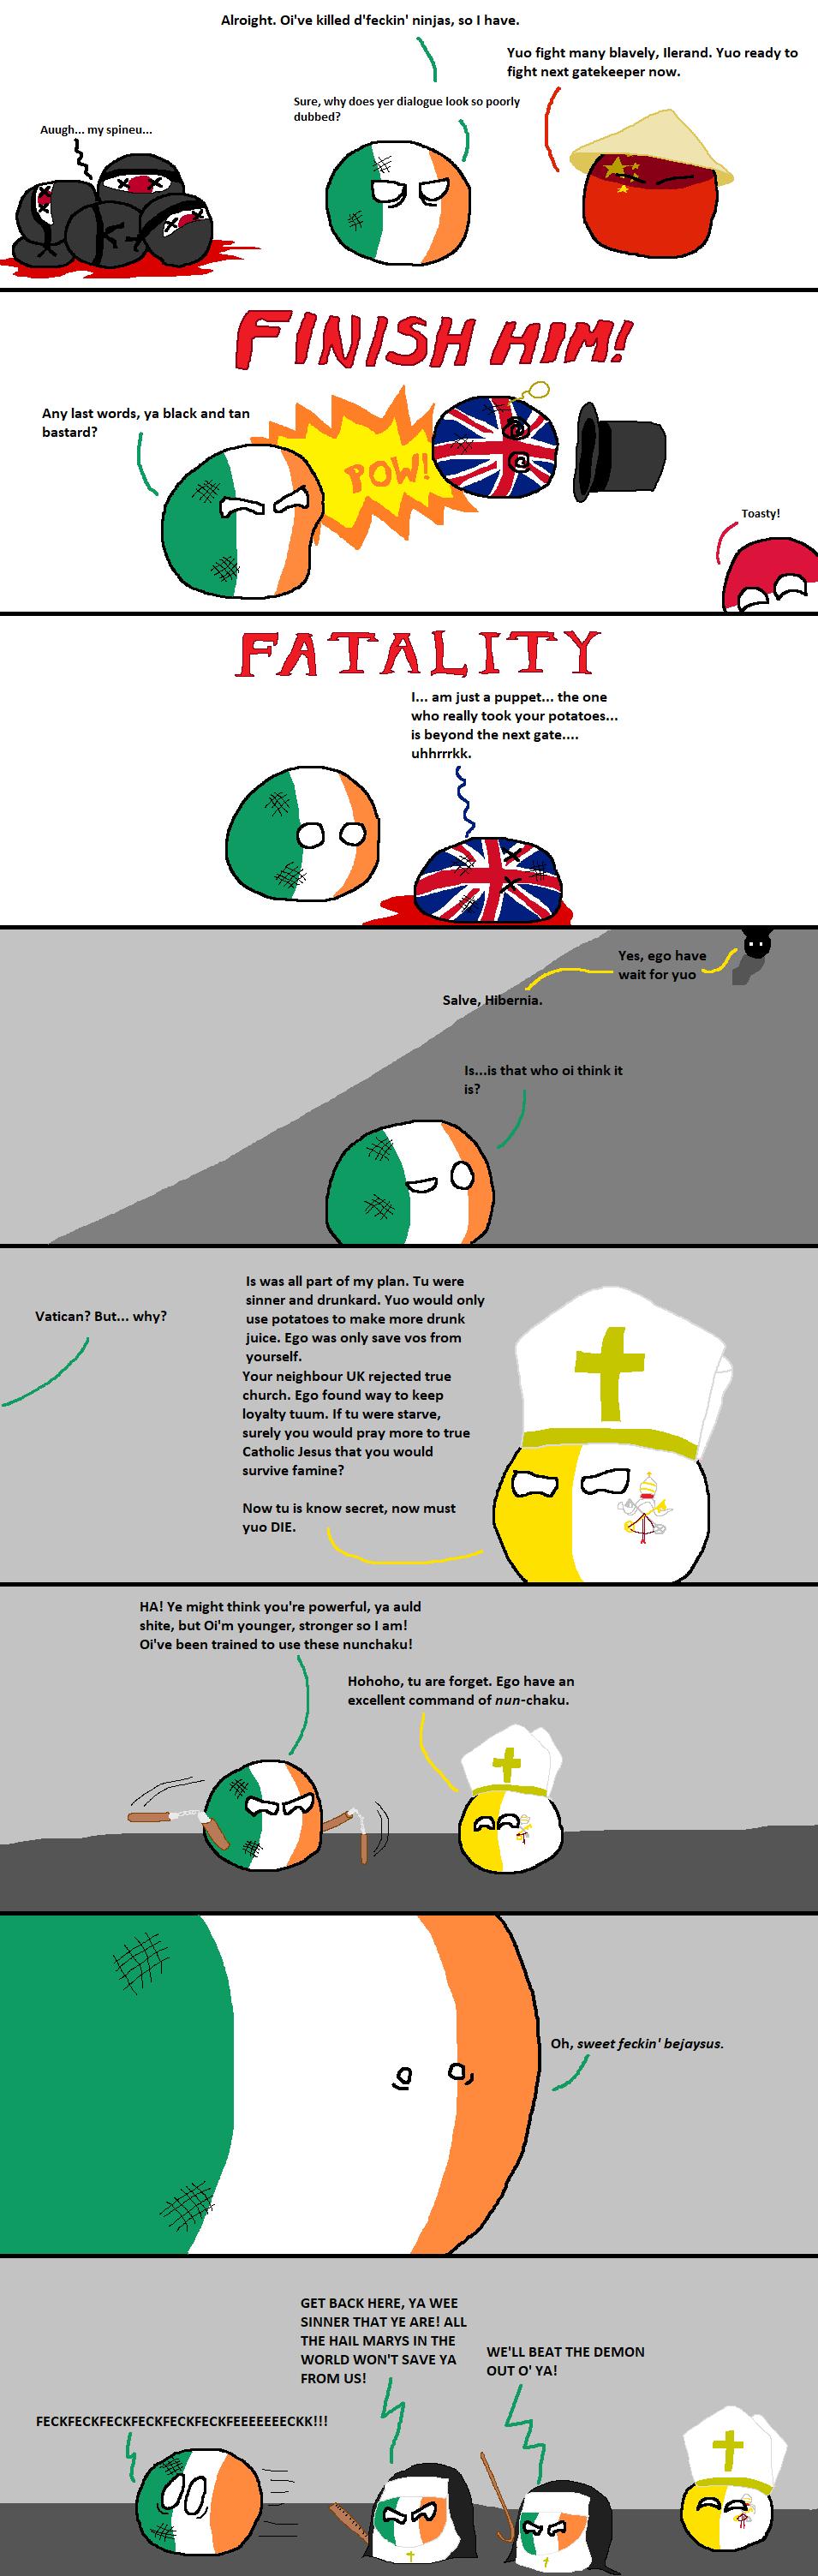 Peter Of Ireland Or Peter Of The Uk Polandball